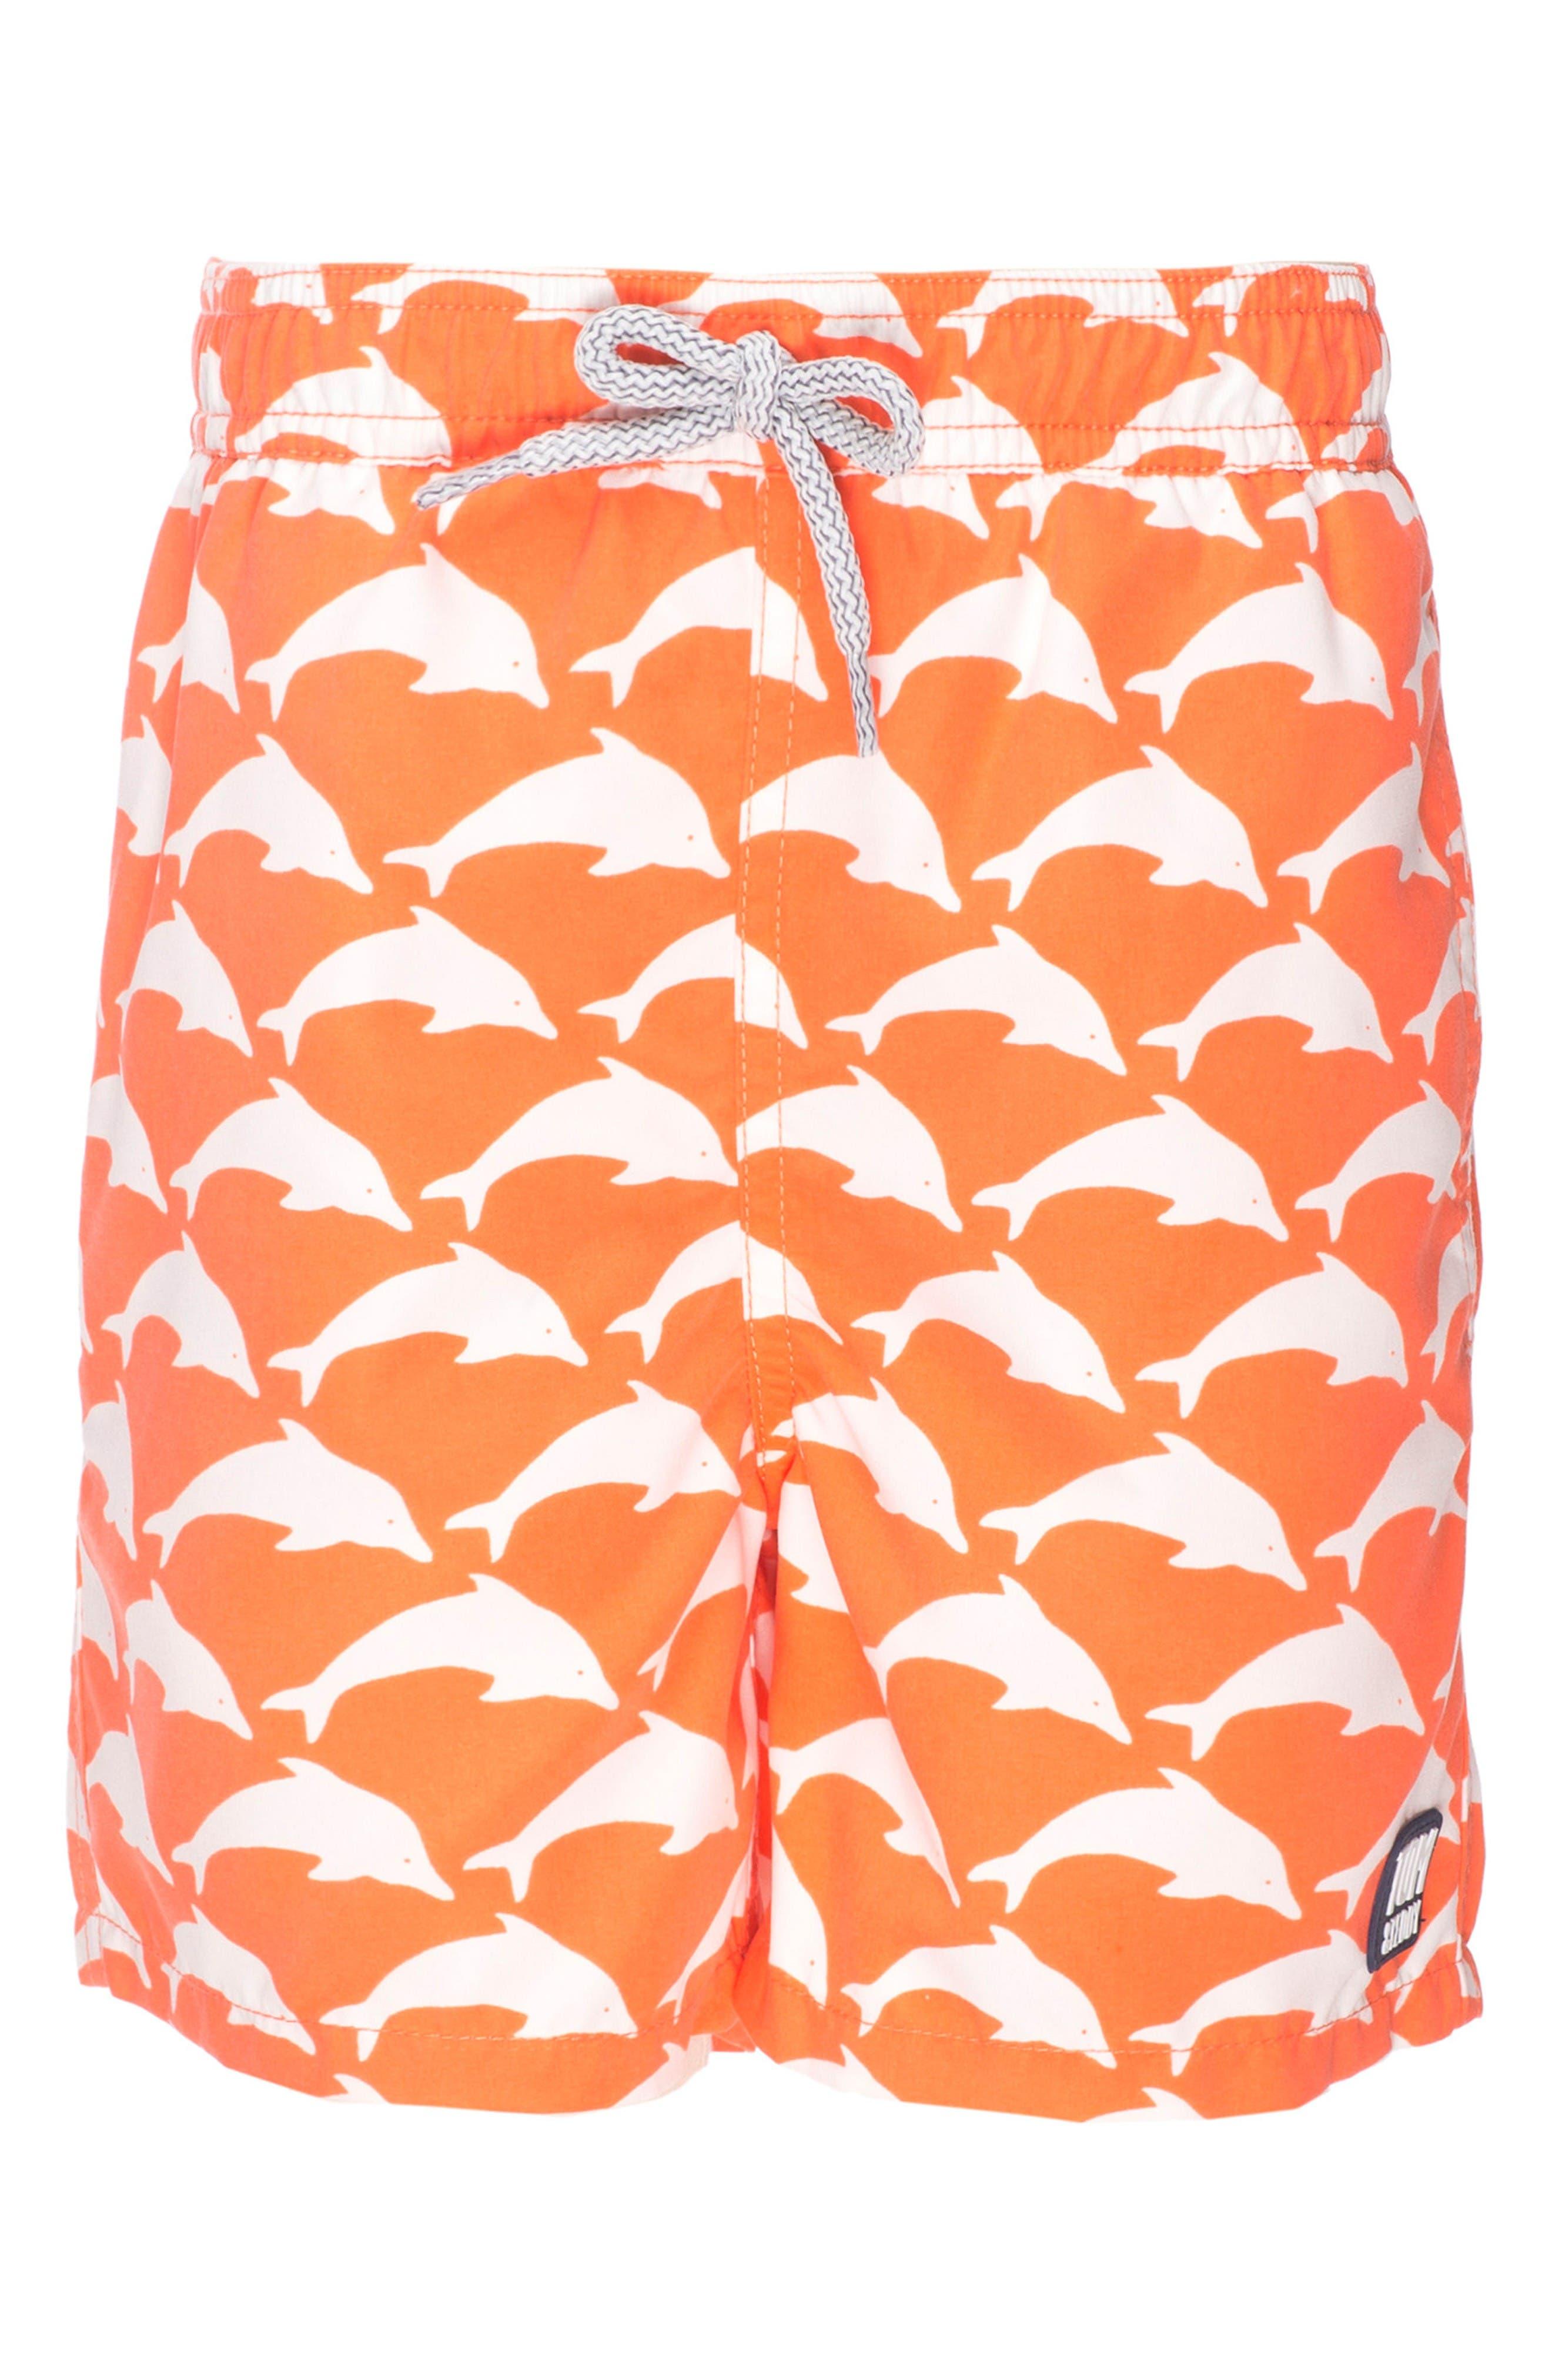 Alternate Image 2  - Tom & Teddy Dolphin Swim Trunks (Toddler Boys, Little Boys & Big Boys)